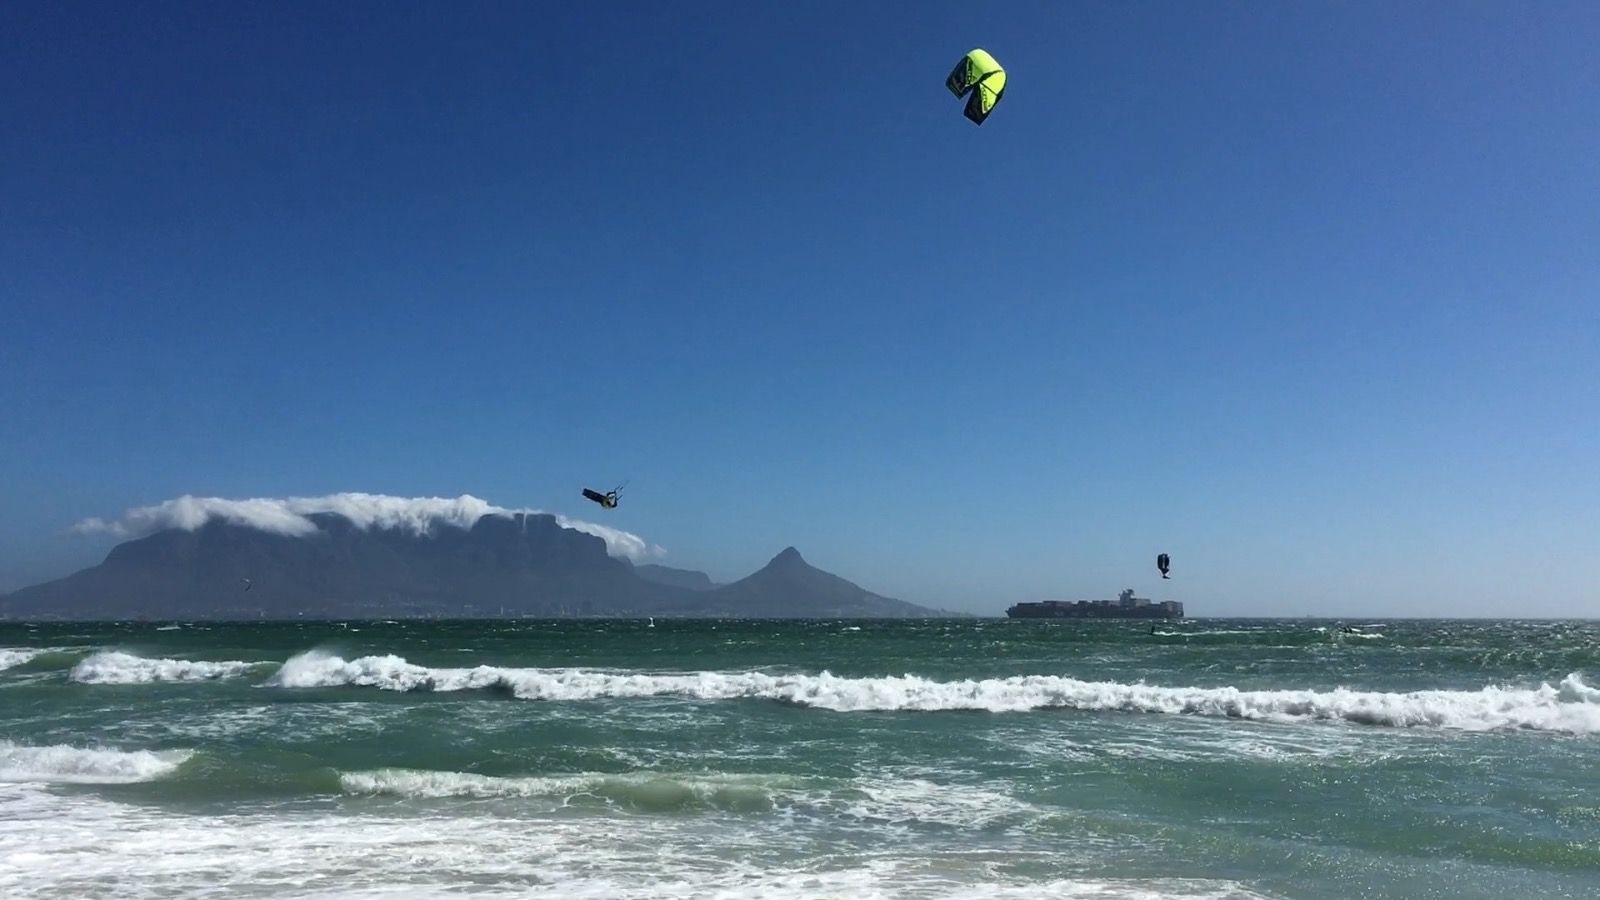 Cloud situation AKA Cape Doctor, ©@Echtzeitreise